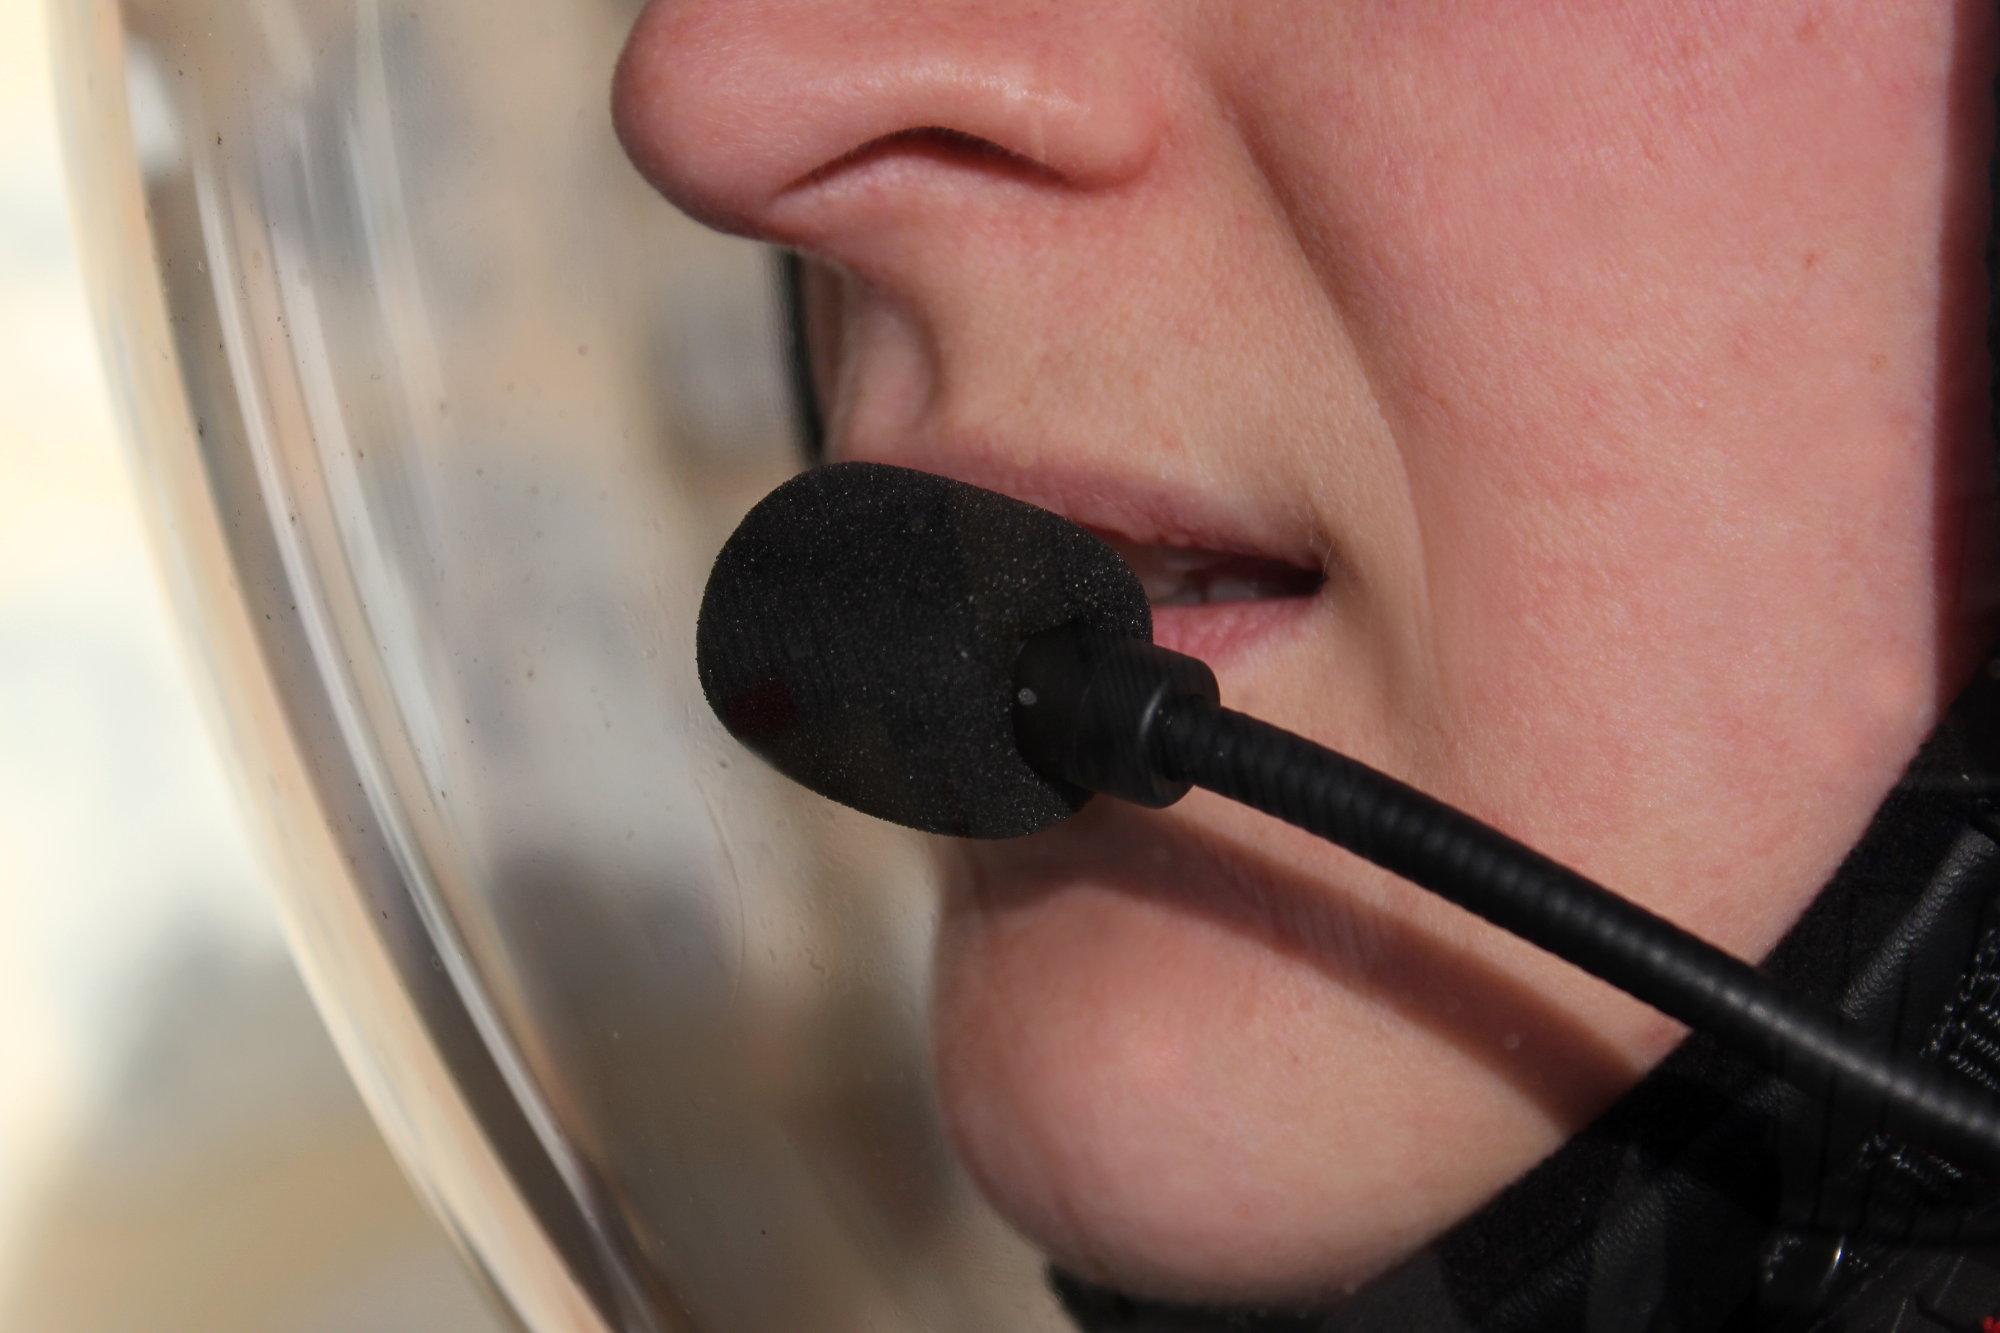 Podréis responder a una llamada telefónica vocalmente (¡es decir, sin soltar el manillar!)